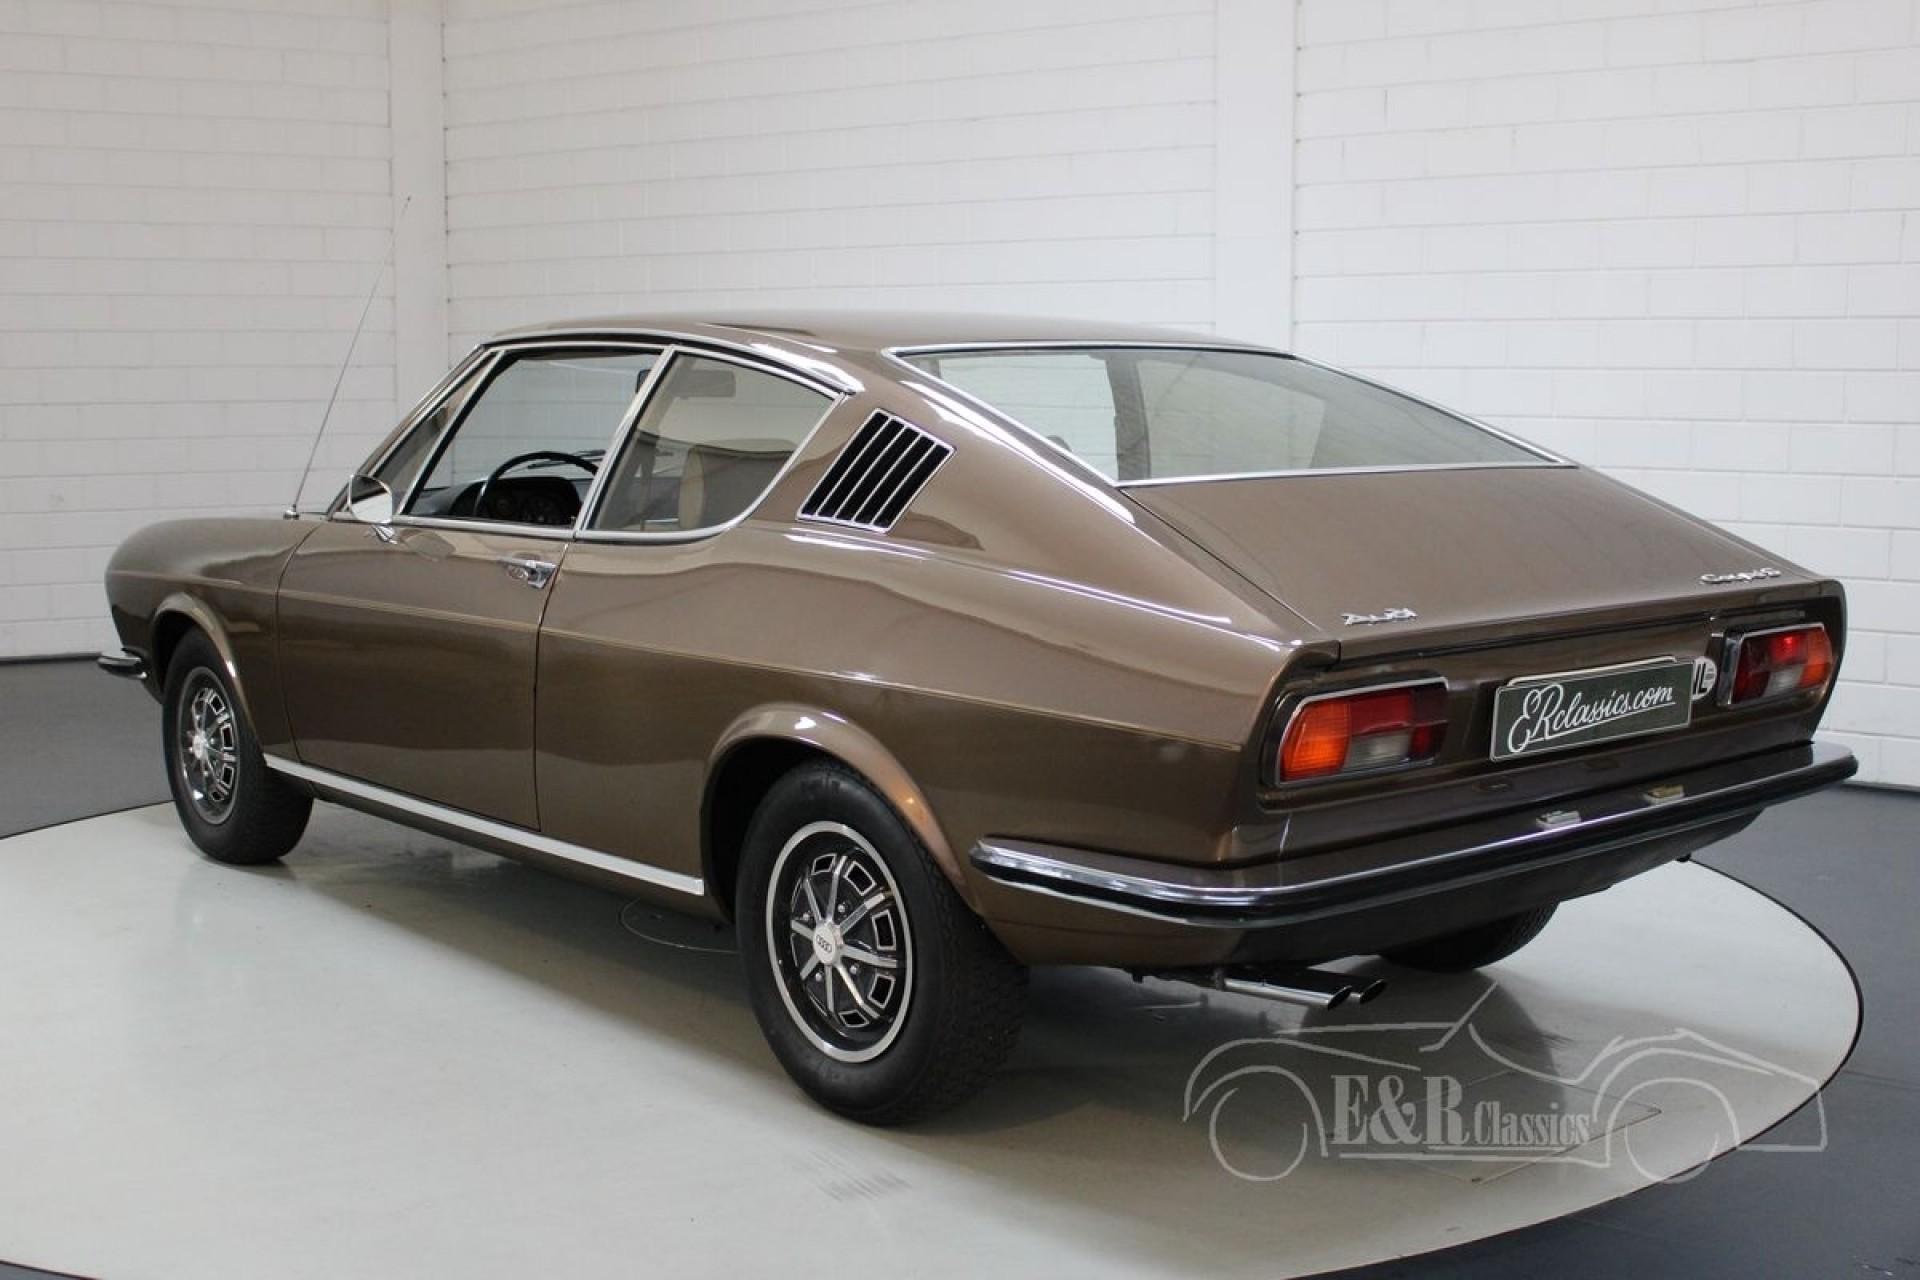 Audi 100 Coupe 1973 erclassics com auto-union-audi-100-coupe-1973-a5947-046